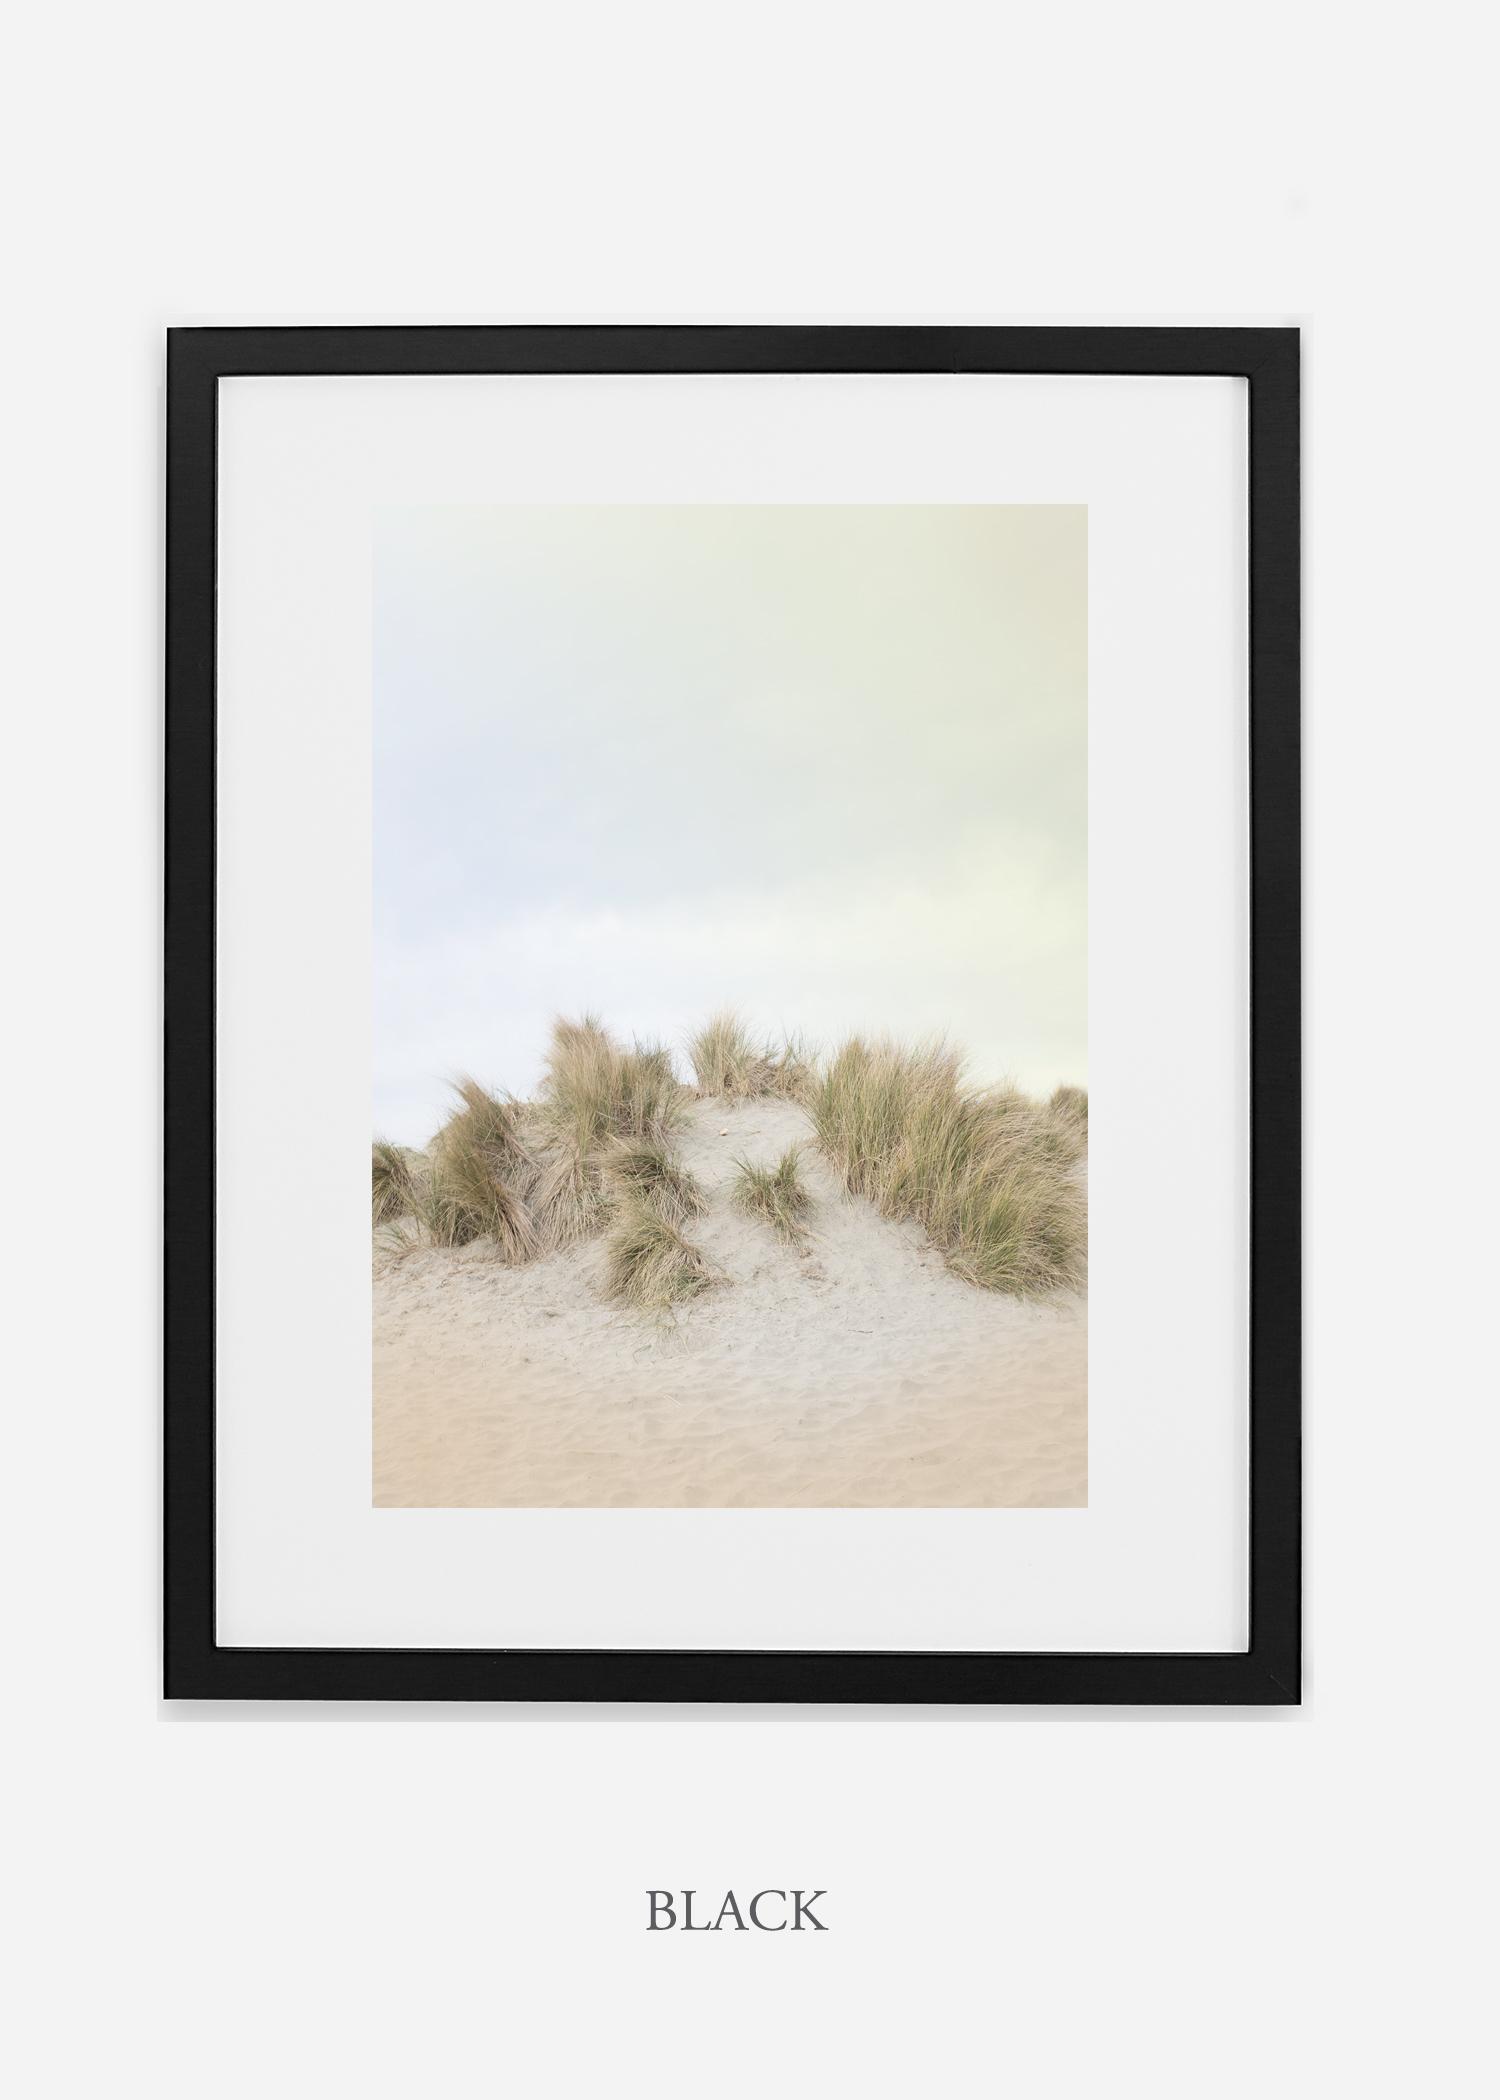 DunesNo.2_blackframe_BigSur_Ocean_Beach__Art_Photography_interiordesign_bohemian_cactusart.jpg